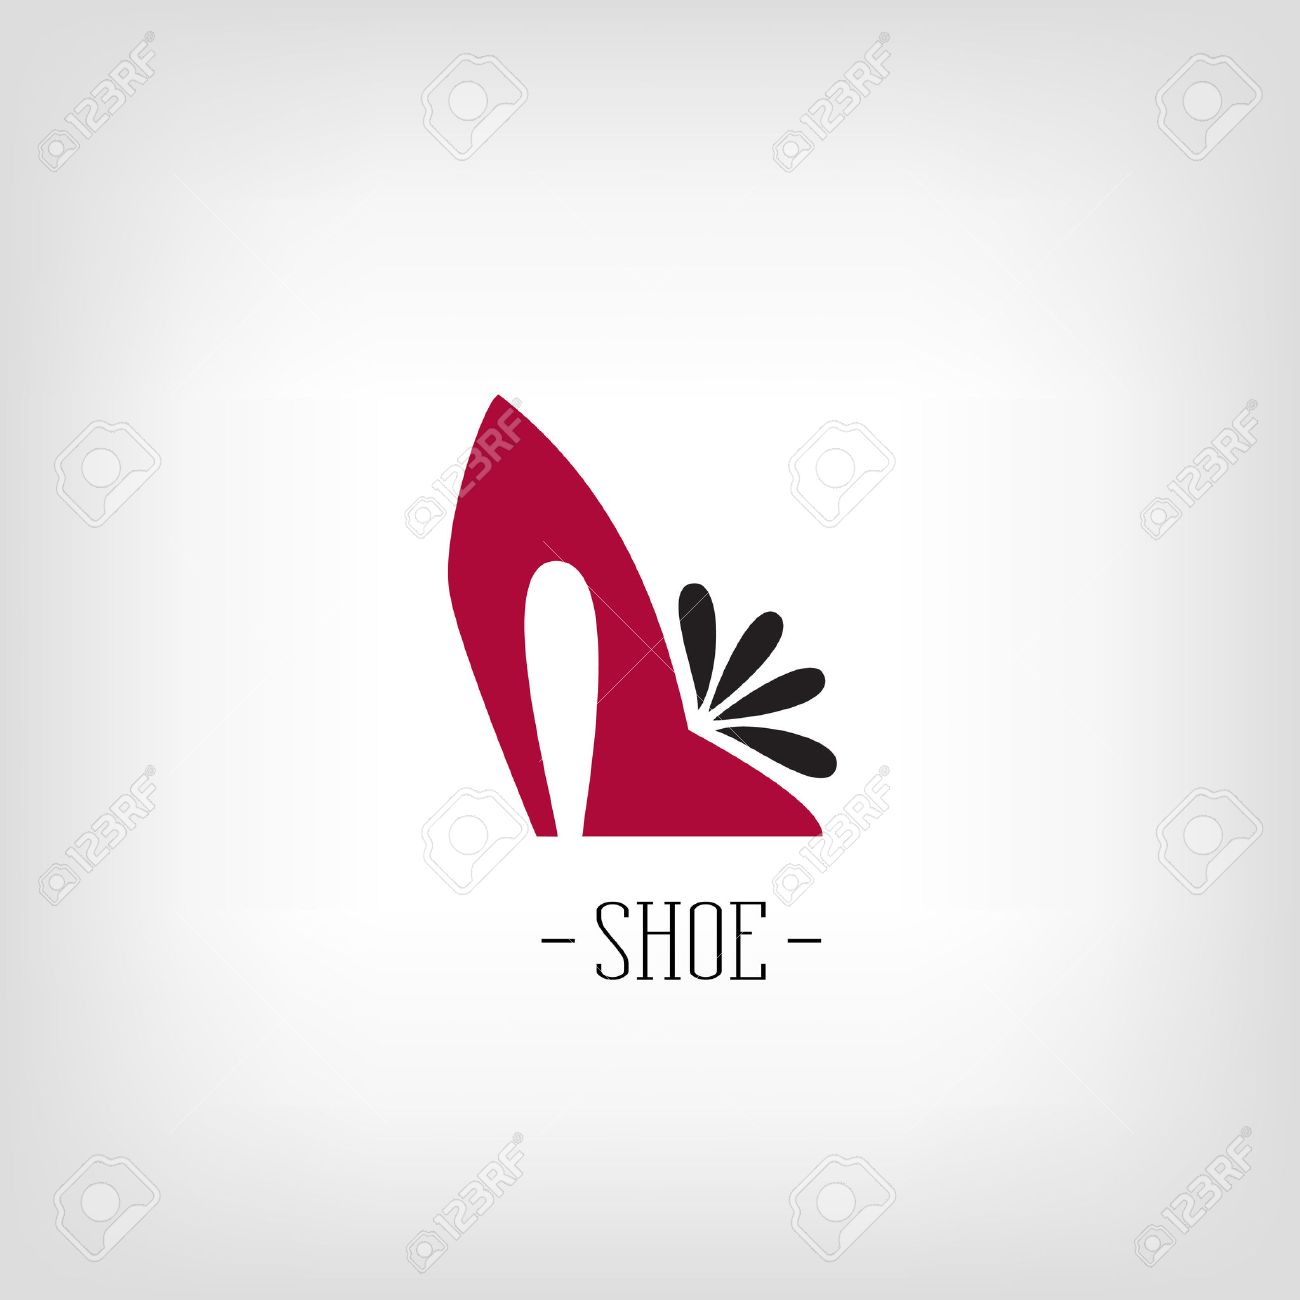 chaussure logo noir rouge femme